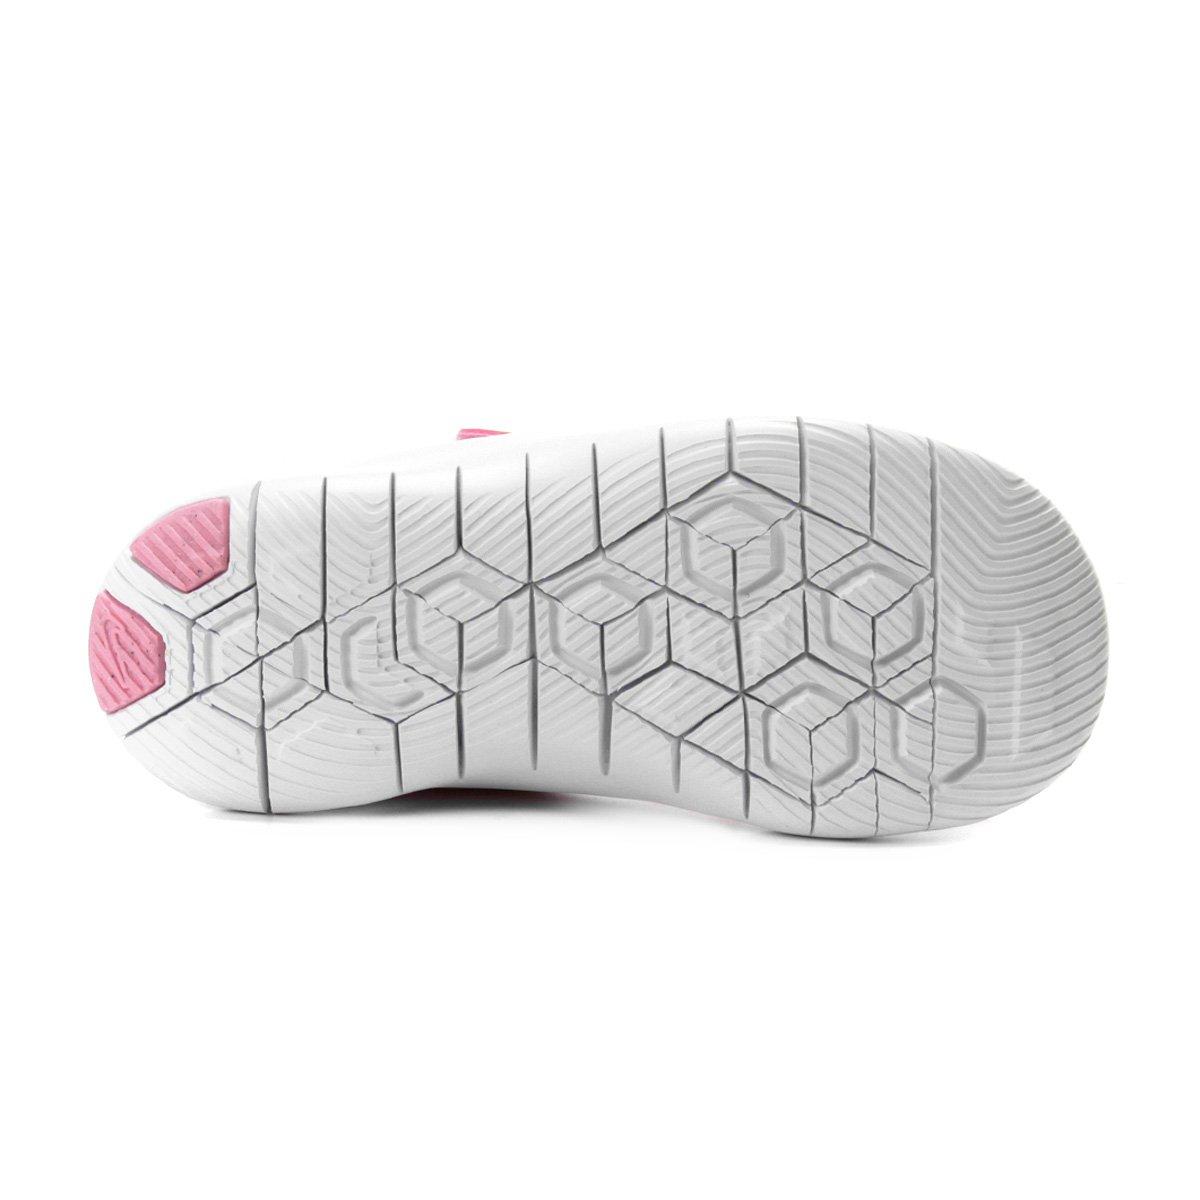 Tênis Infantil Nike Flex Contact 2 Feminino Rosa e Branco